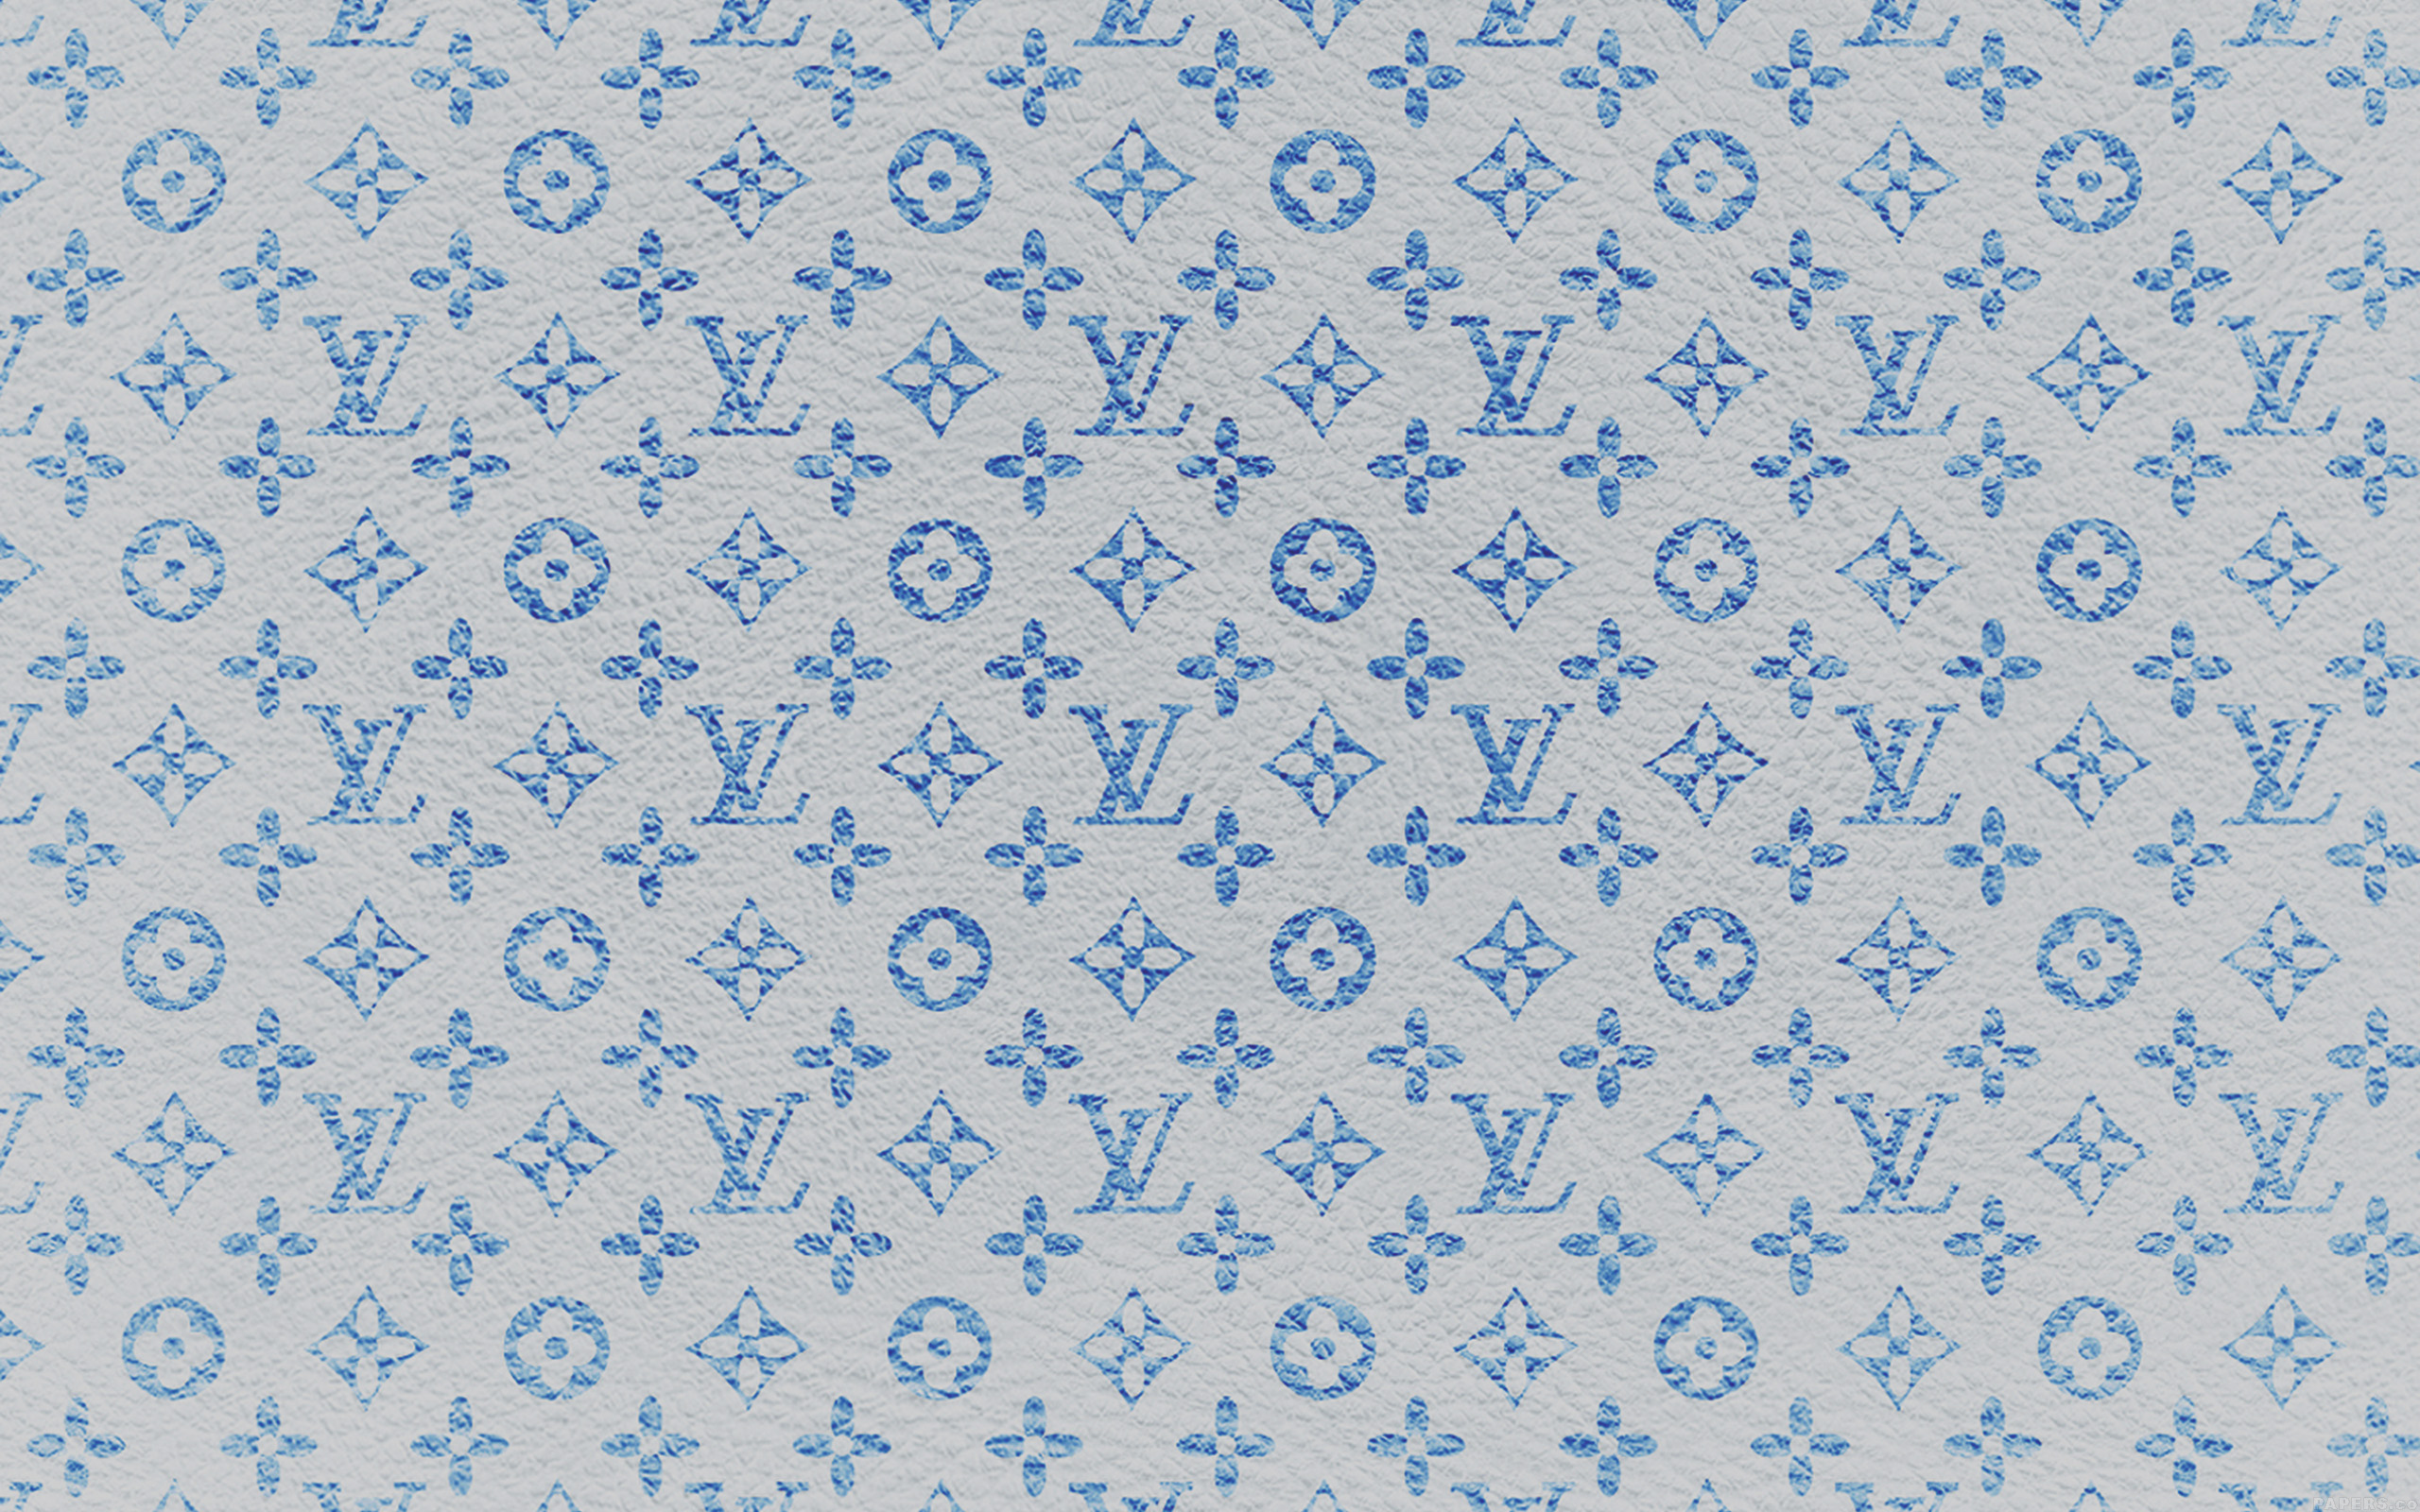 Lv Iphone Wallpaper Vf21 Louis Vuitton Blue Pattern Art Papers Co